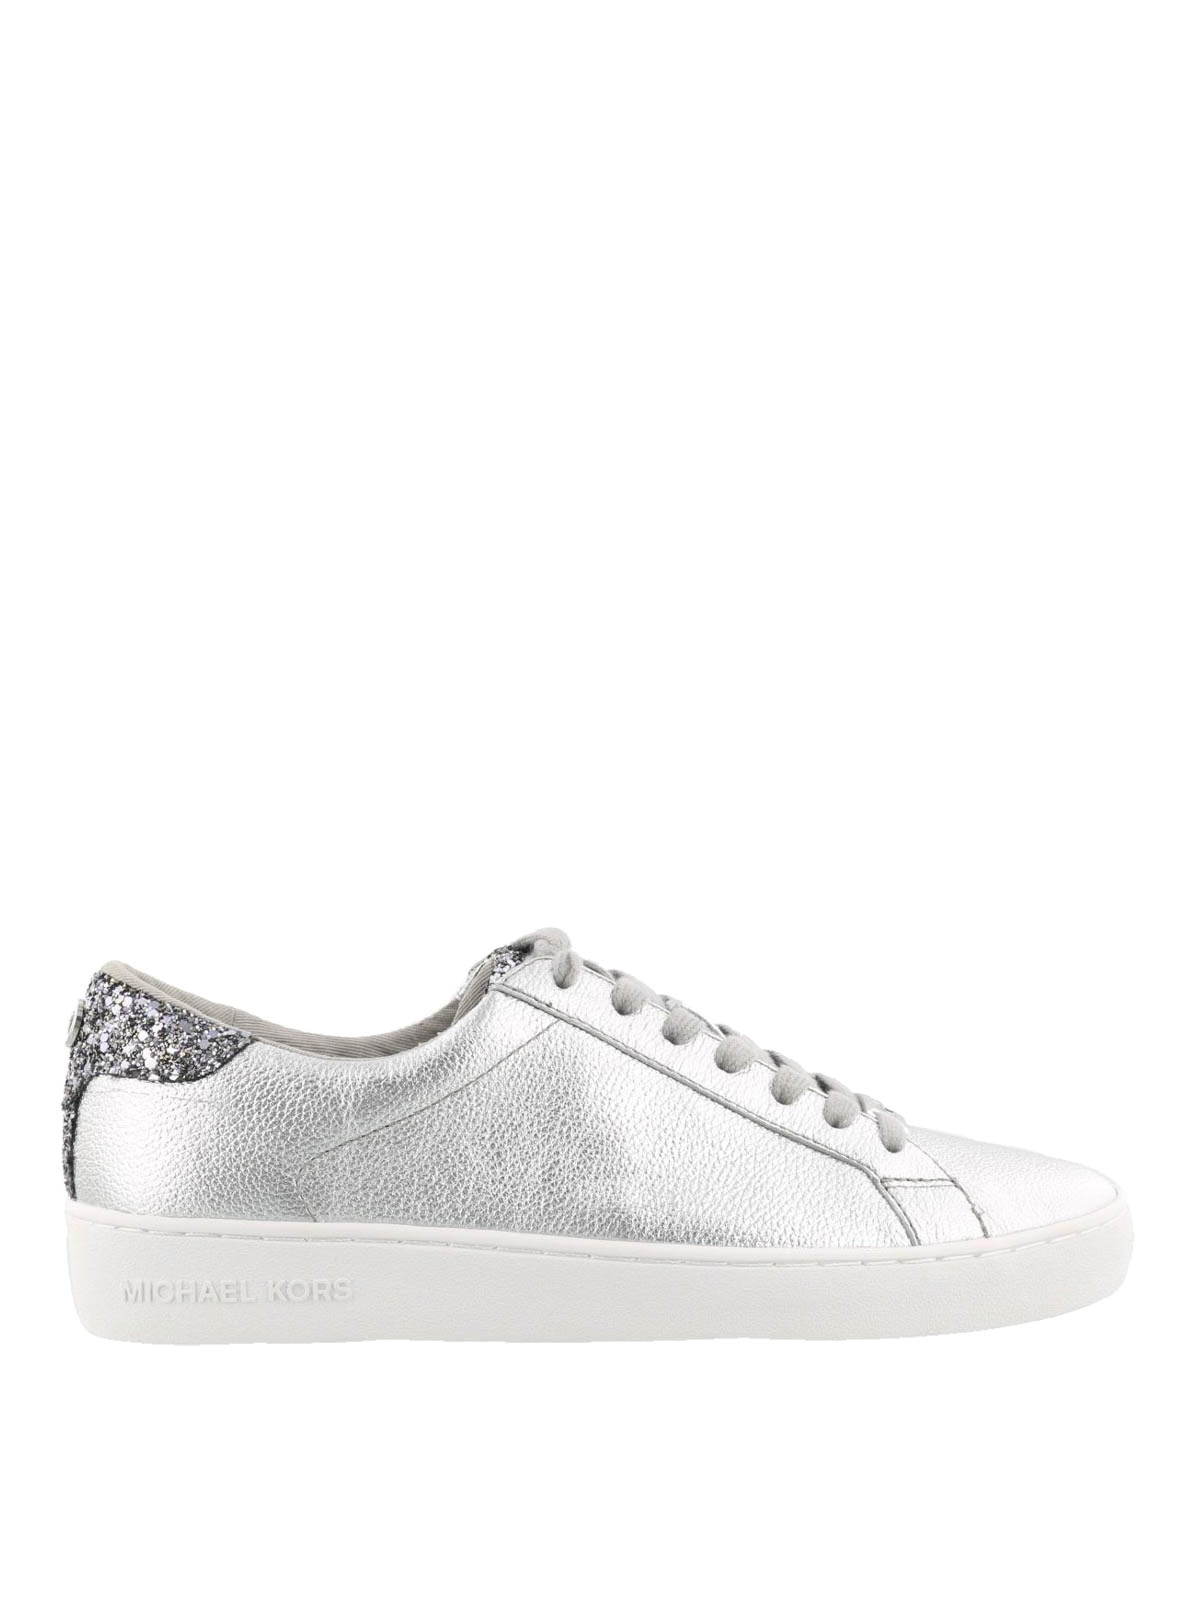 c0a02b6878ec Michael Kors - Irving glitter silver sneakers - trainers - 43R8IRFS1M040